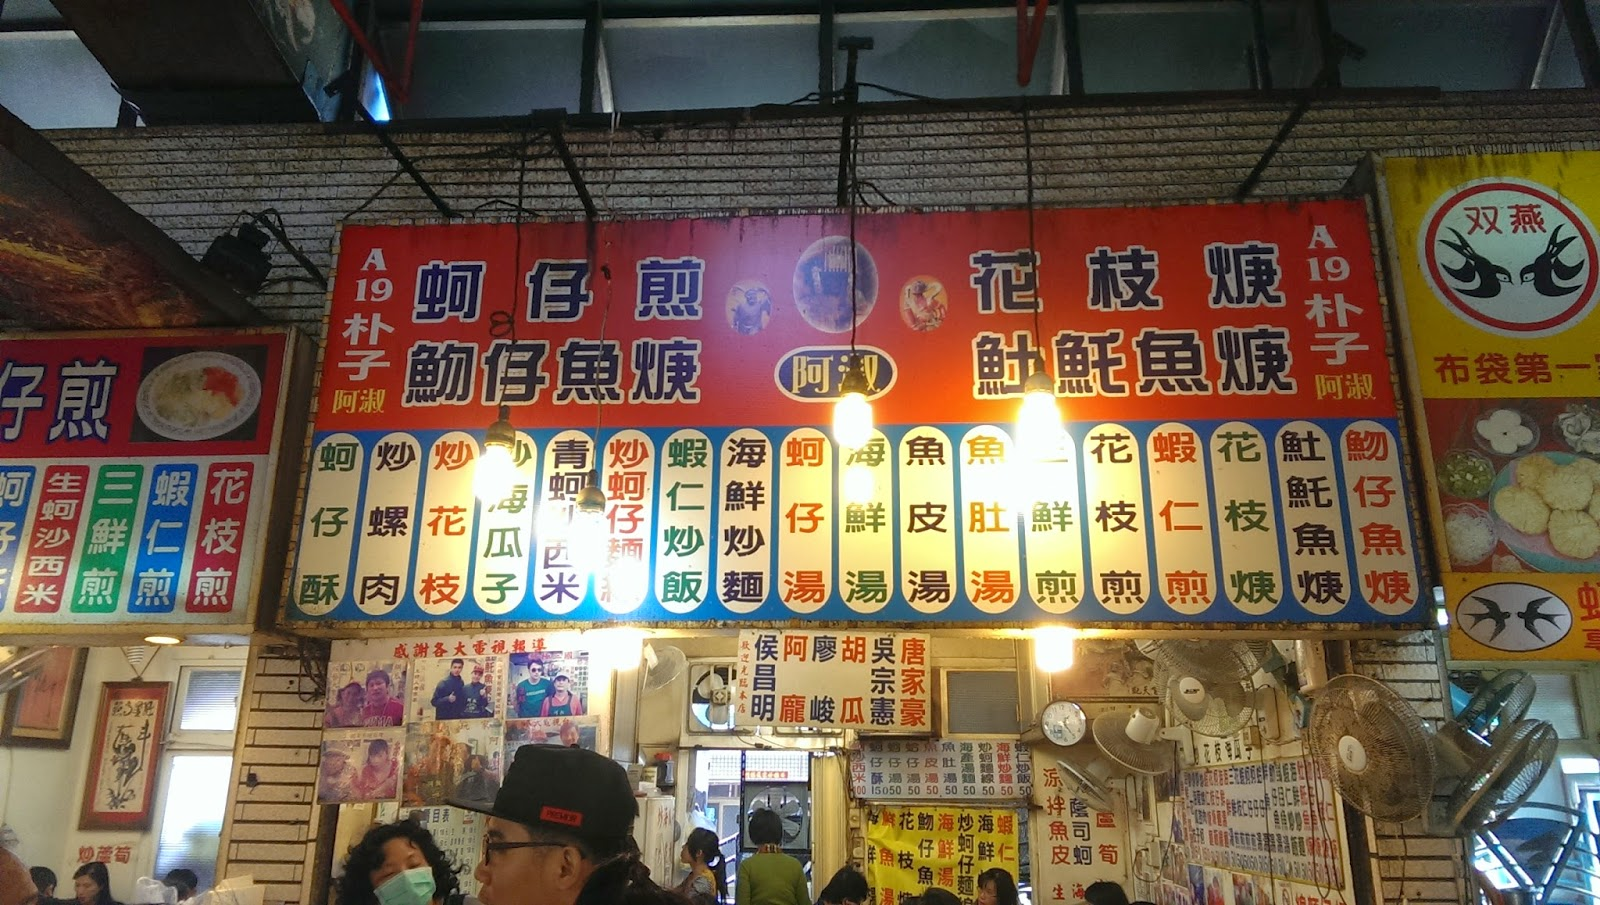 2015 02 02%2B13.22.05 - [食記] 葉家生魚片 - 布袋觀光漁市中的鮮魚餐廳